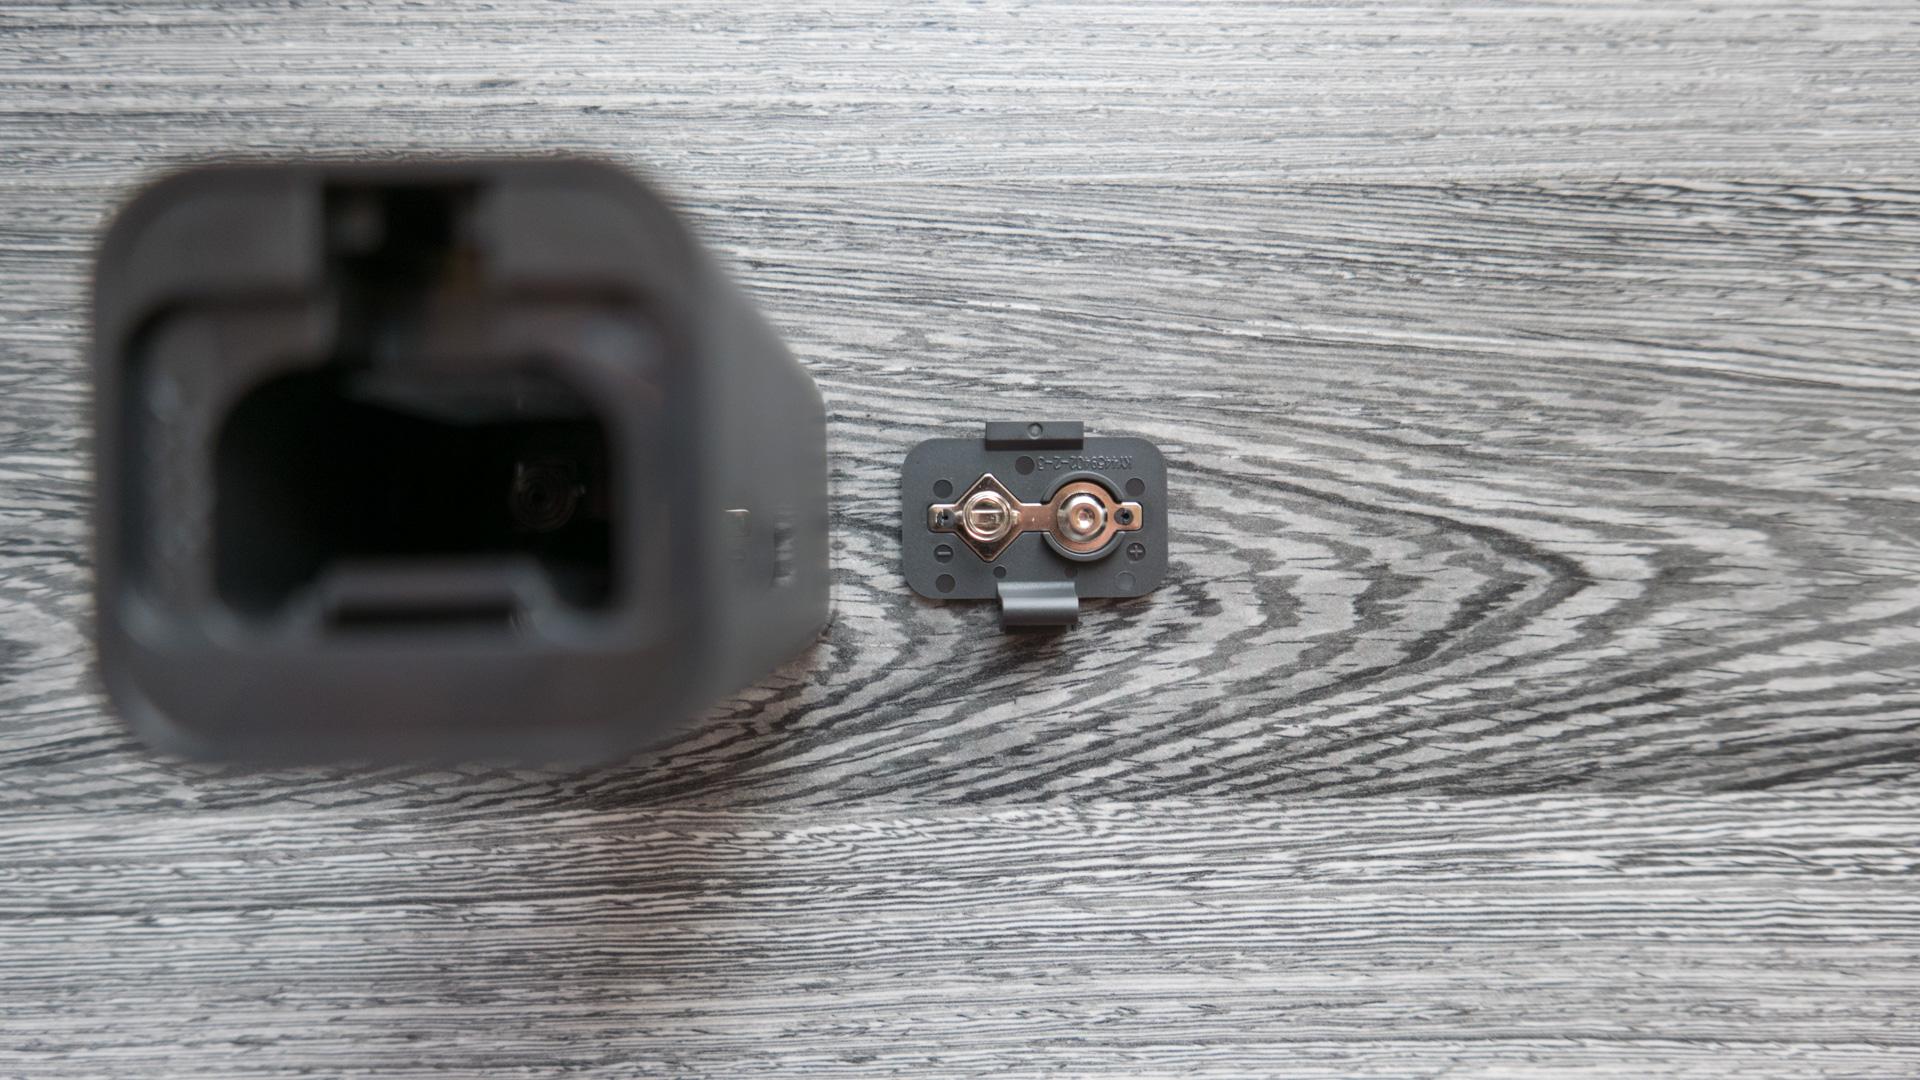 iRobot Roomba 980 Virtual Wall 08